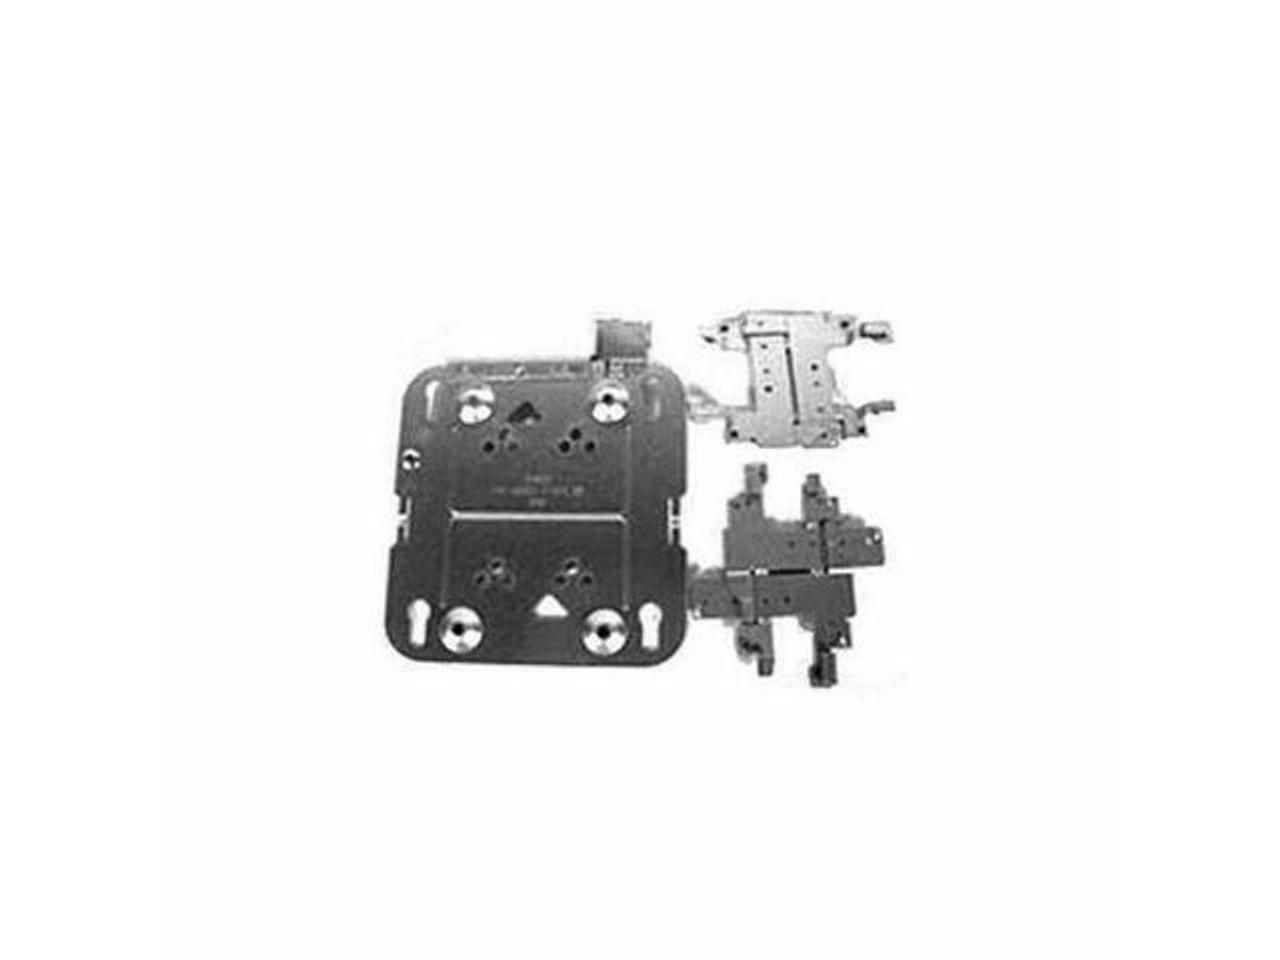 Cisco Aironet 1140 Series mounting kit